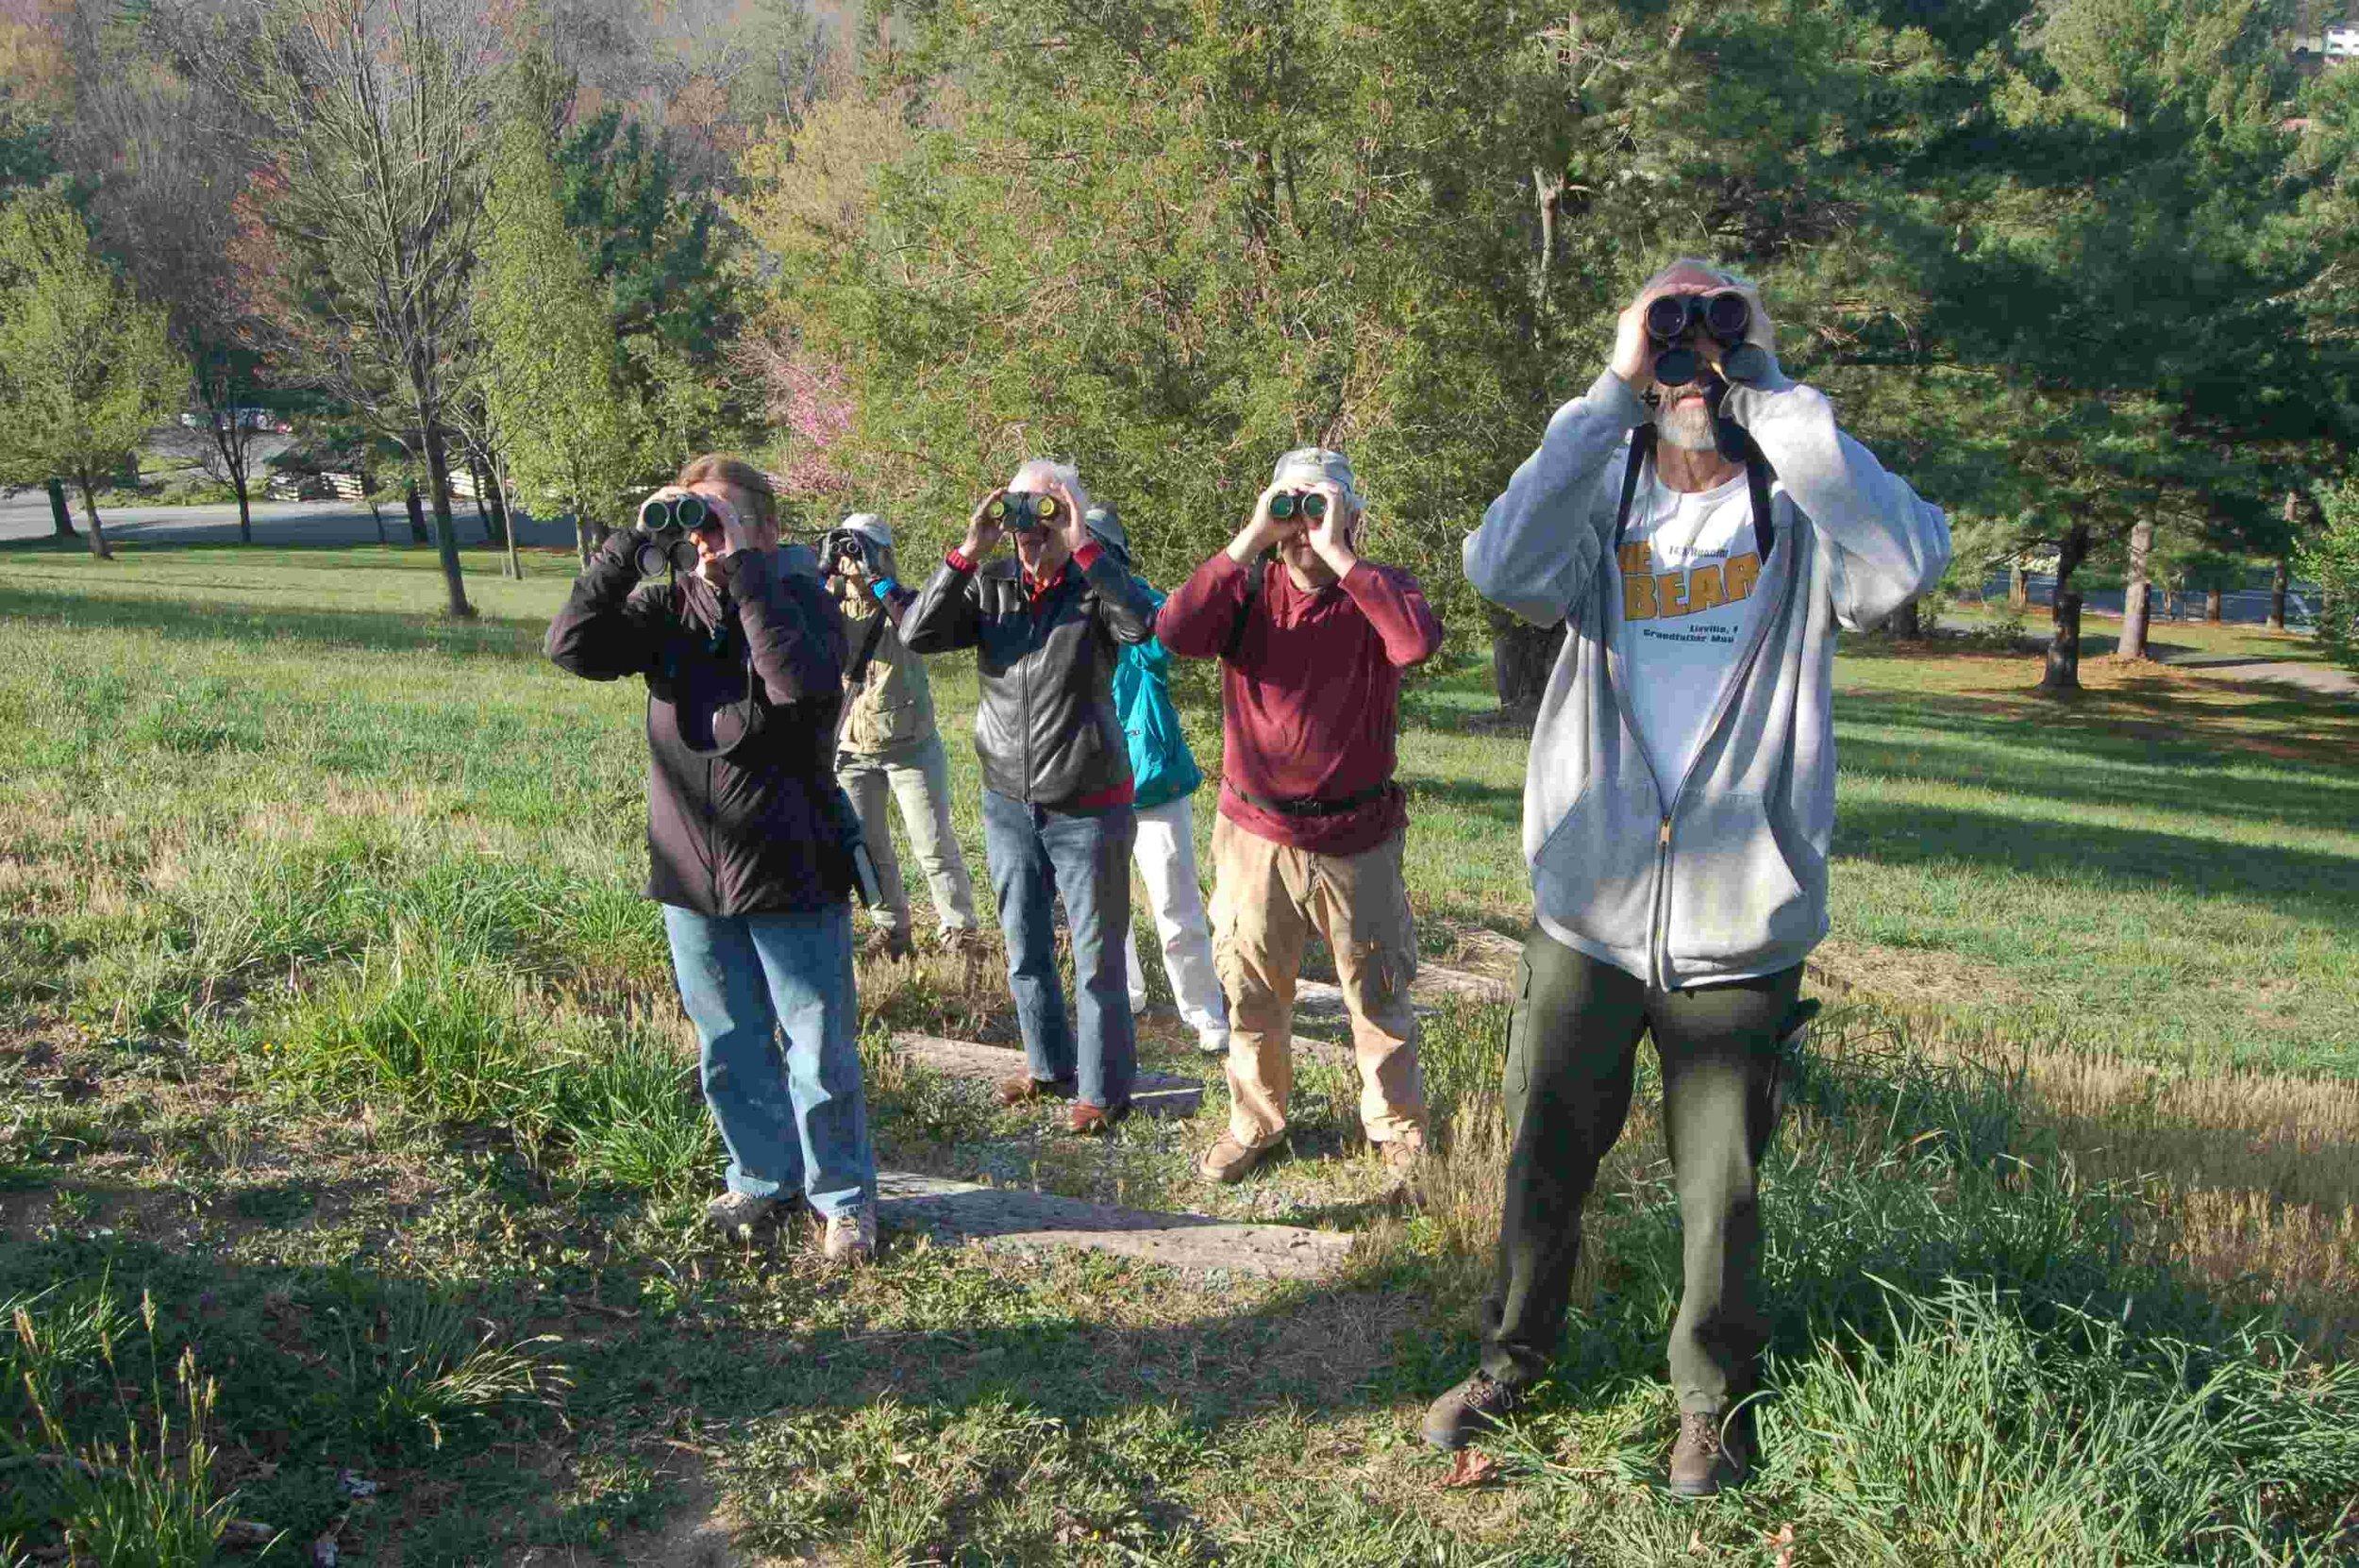 Birdwatchers enjoy spring migration